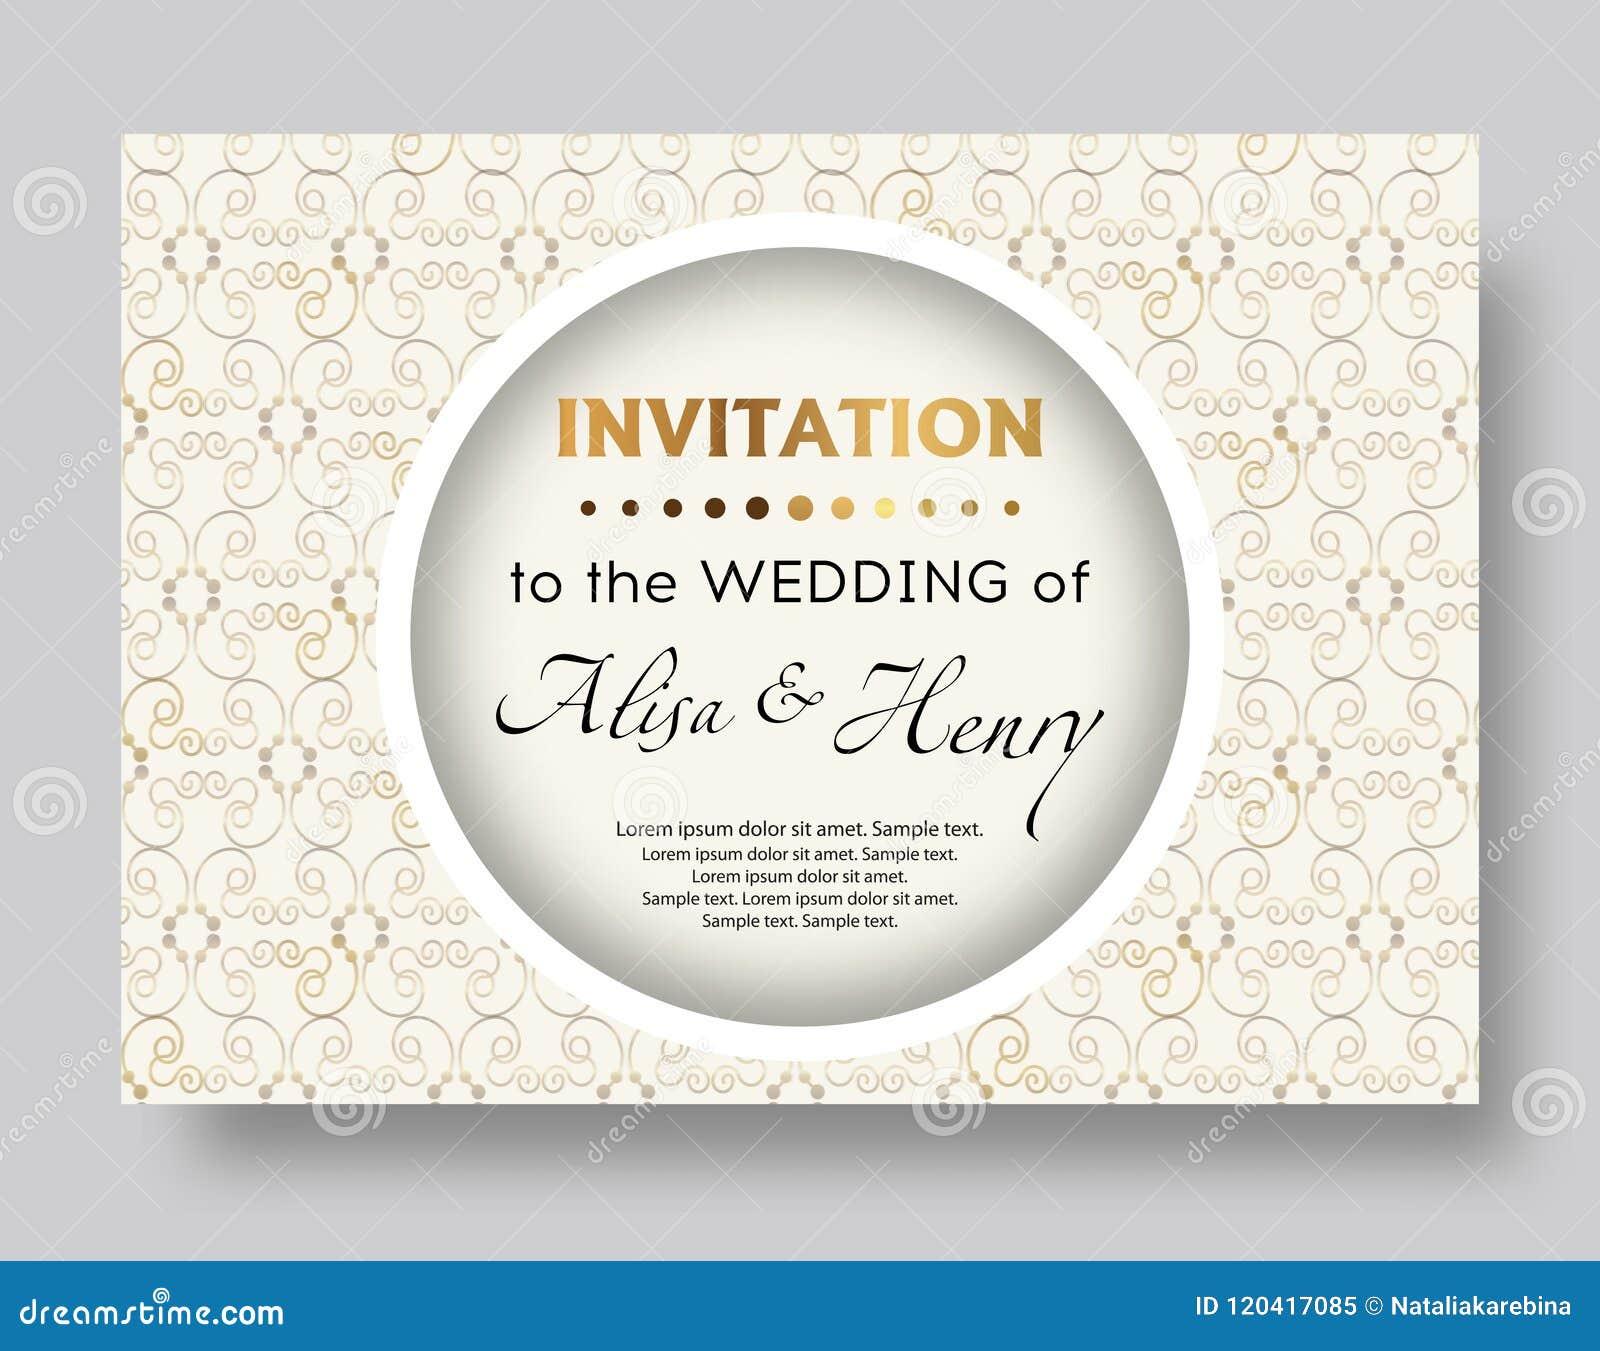 wedding invitation template elegant background with golden